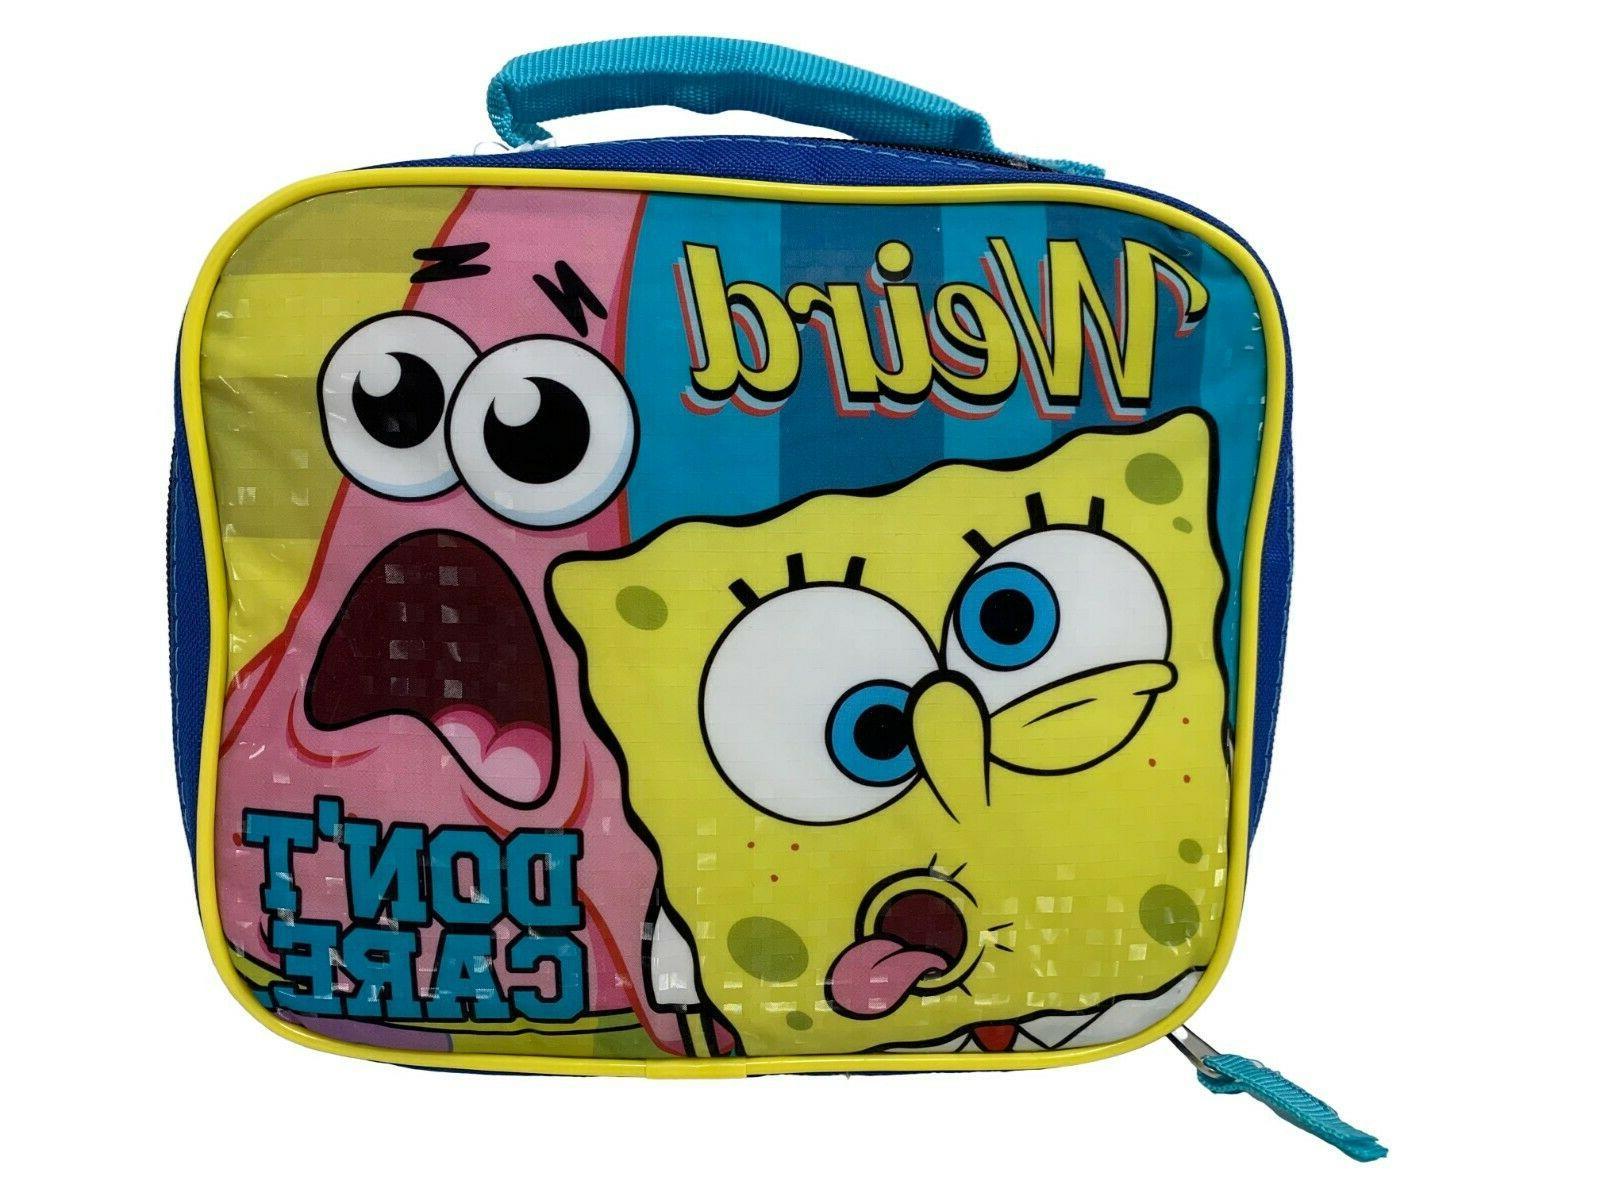 9 5 spongebob square pants soft lunch